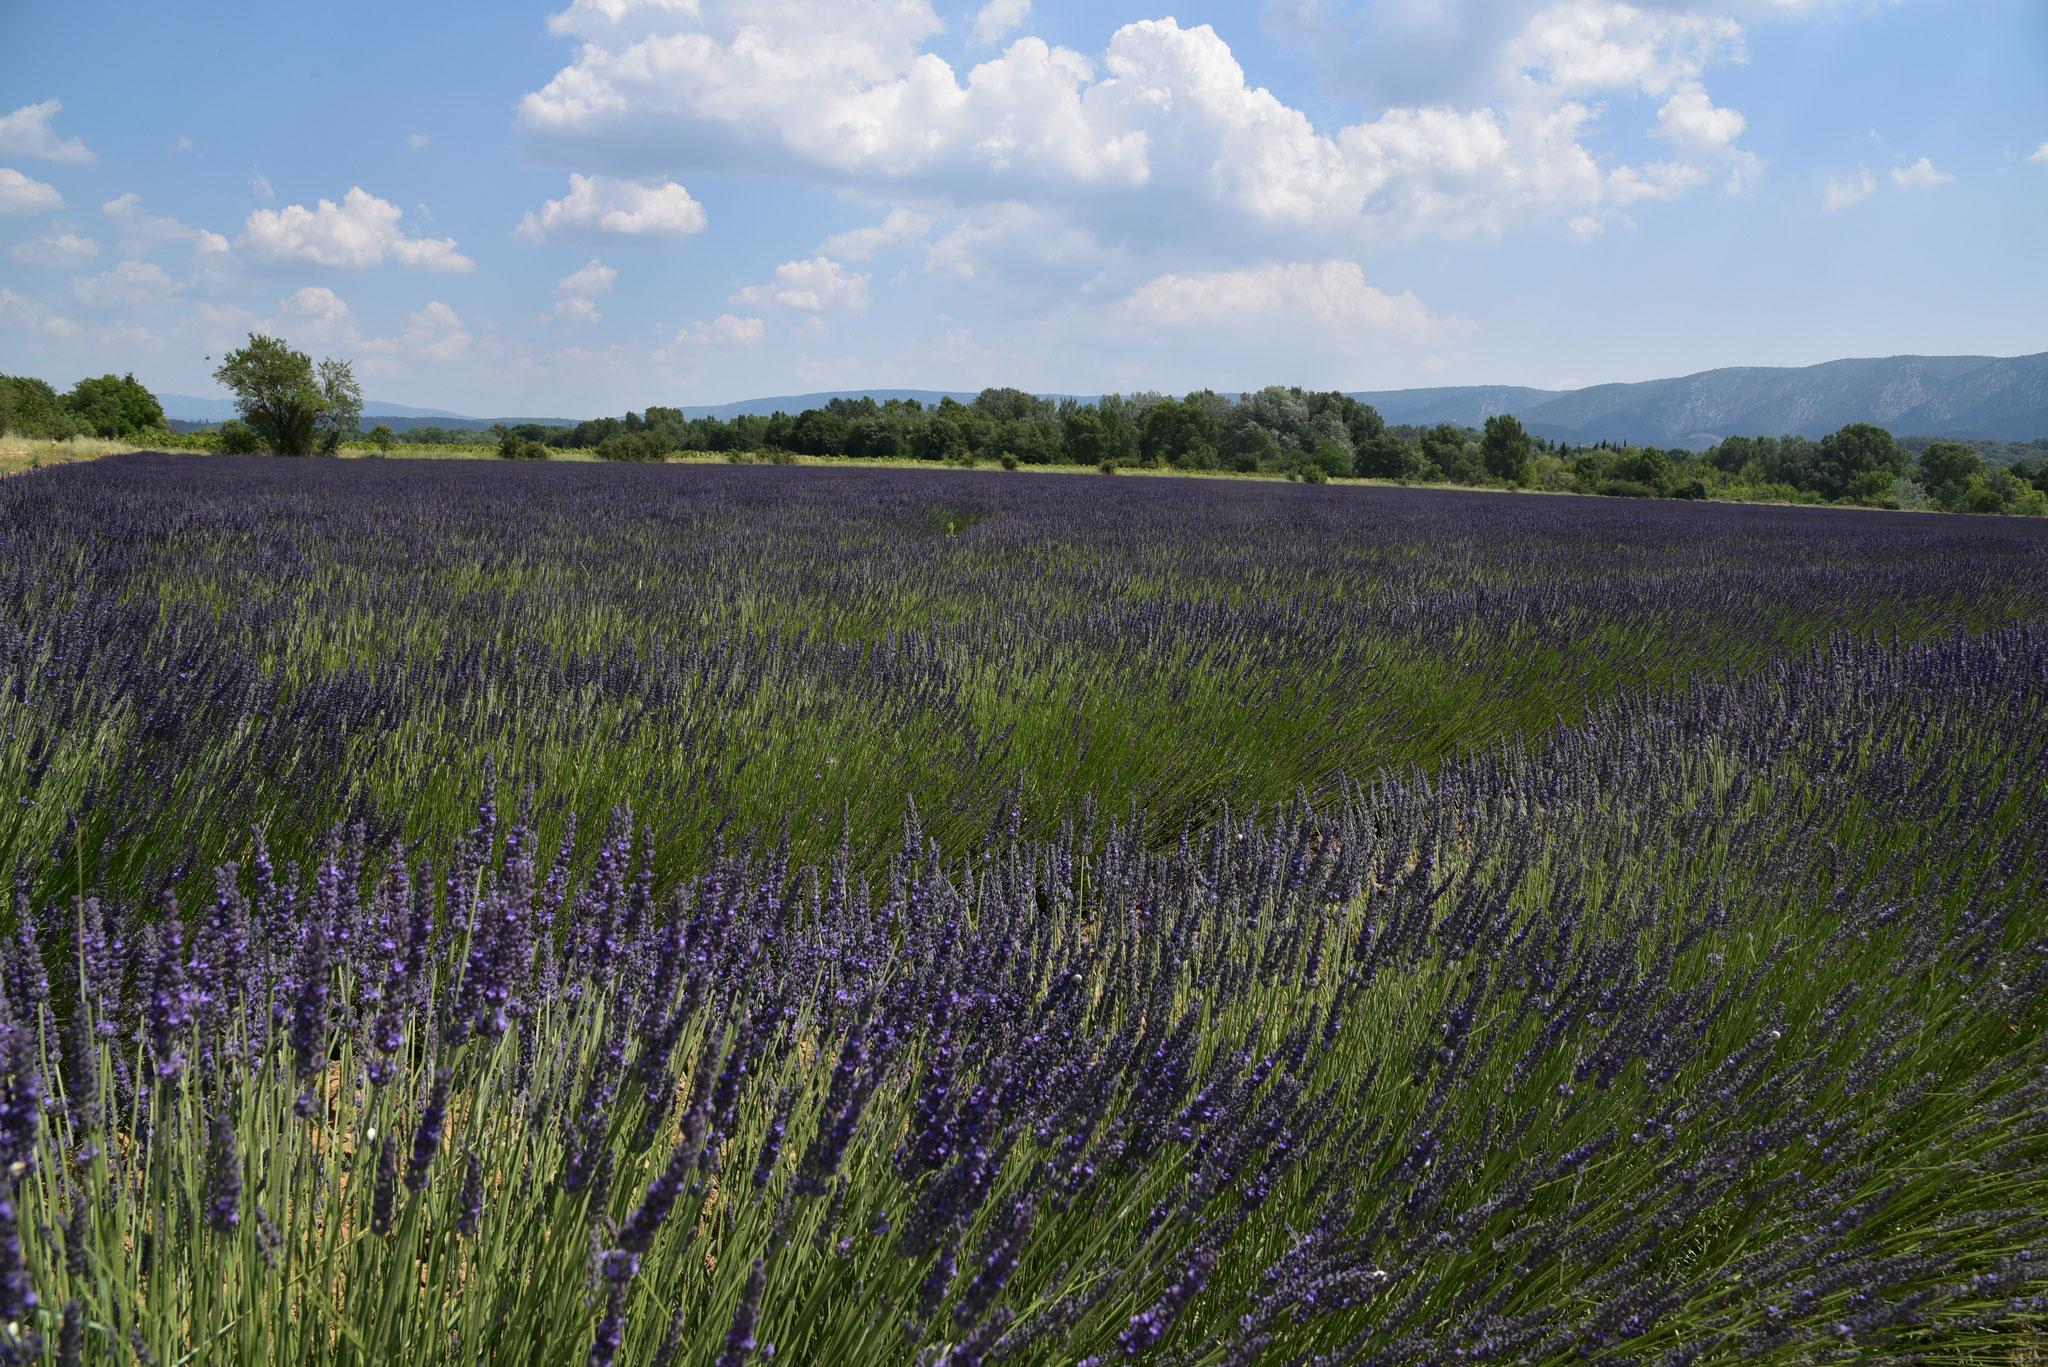 Lavendelfeld Mitte Juni 2021